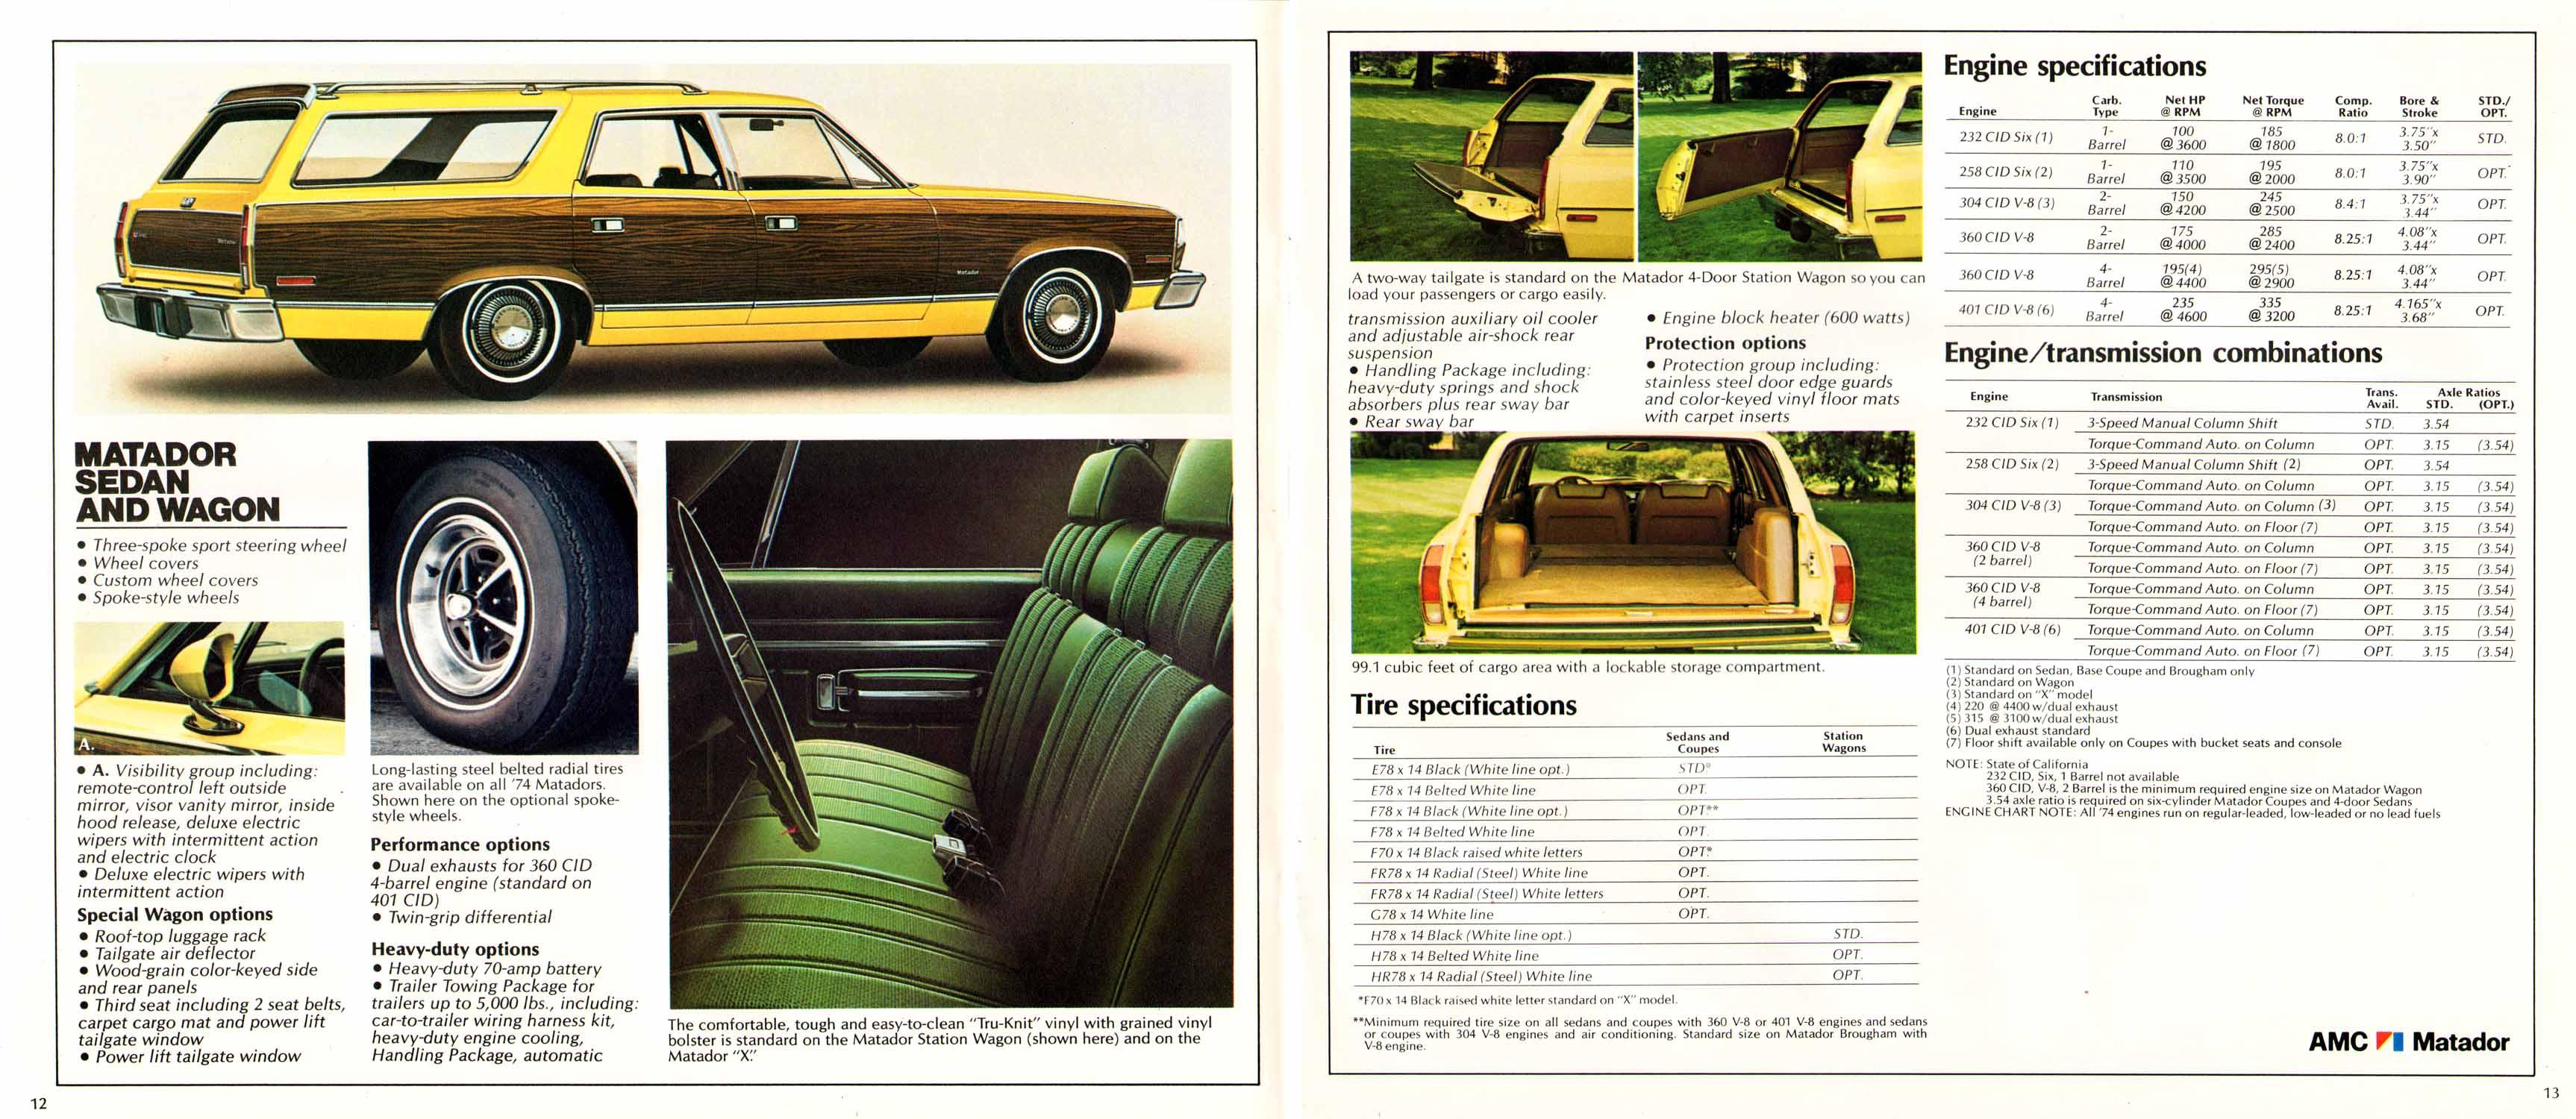 Image 1974 Amc Prestige 12 13 Classic Car Wiring Harness Kits